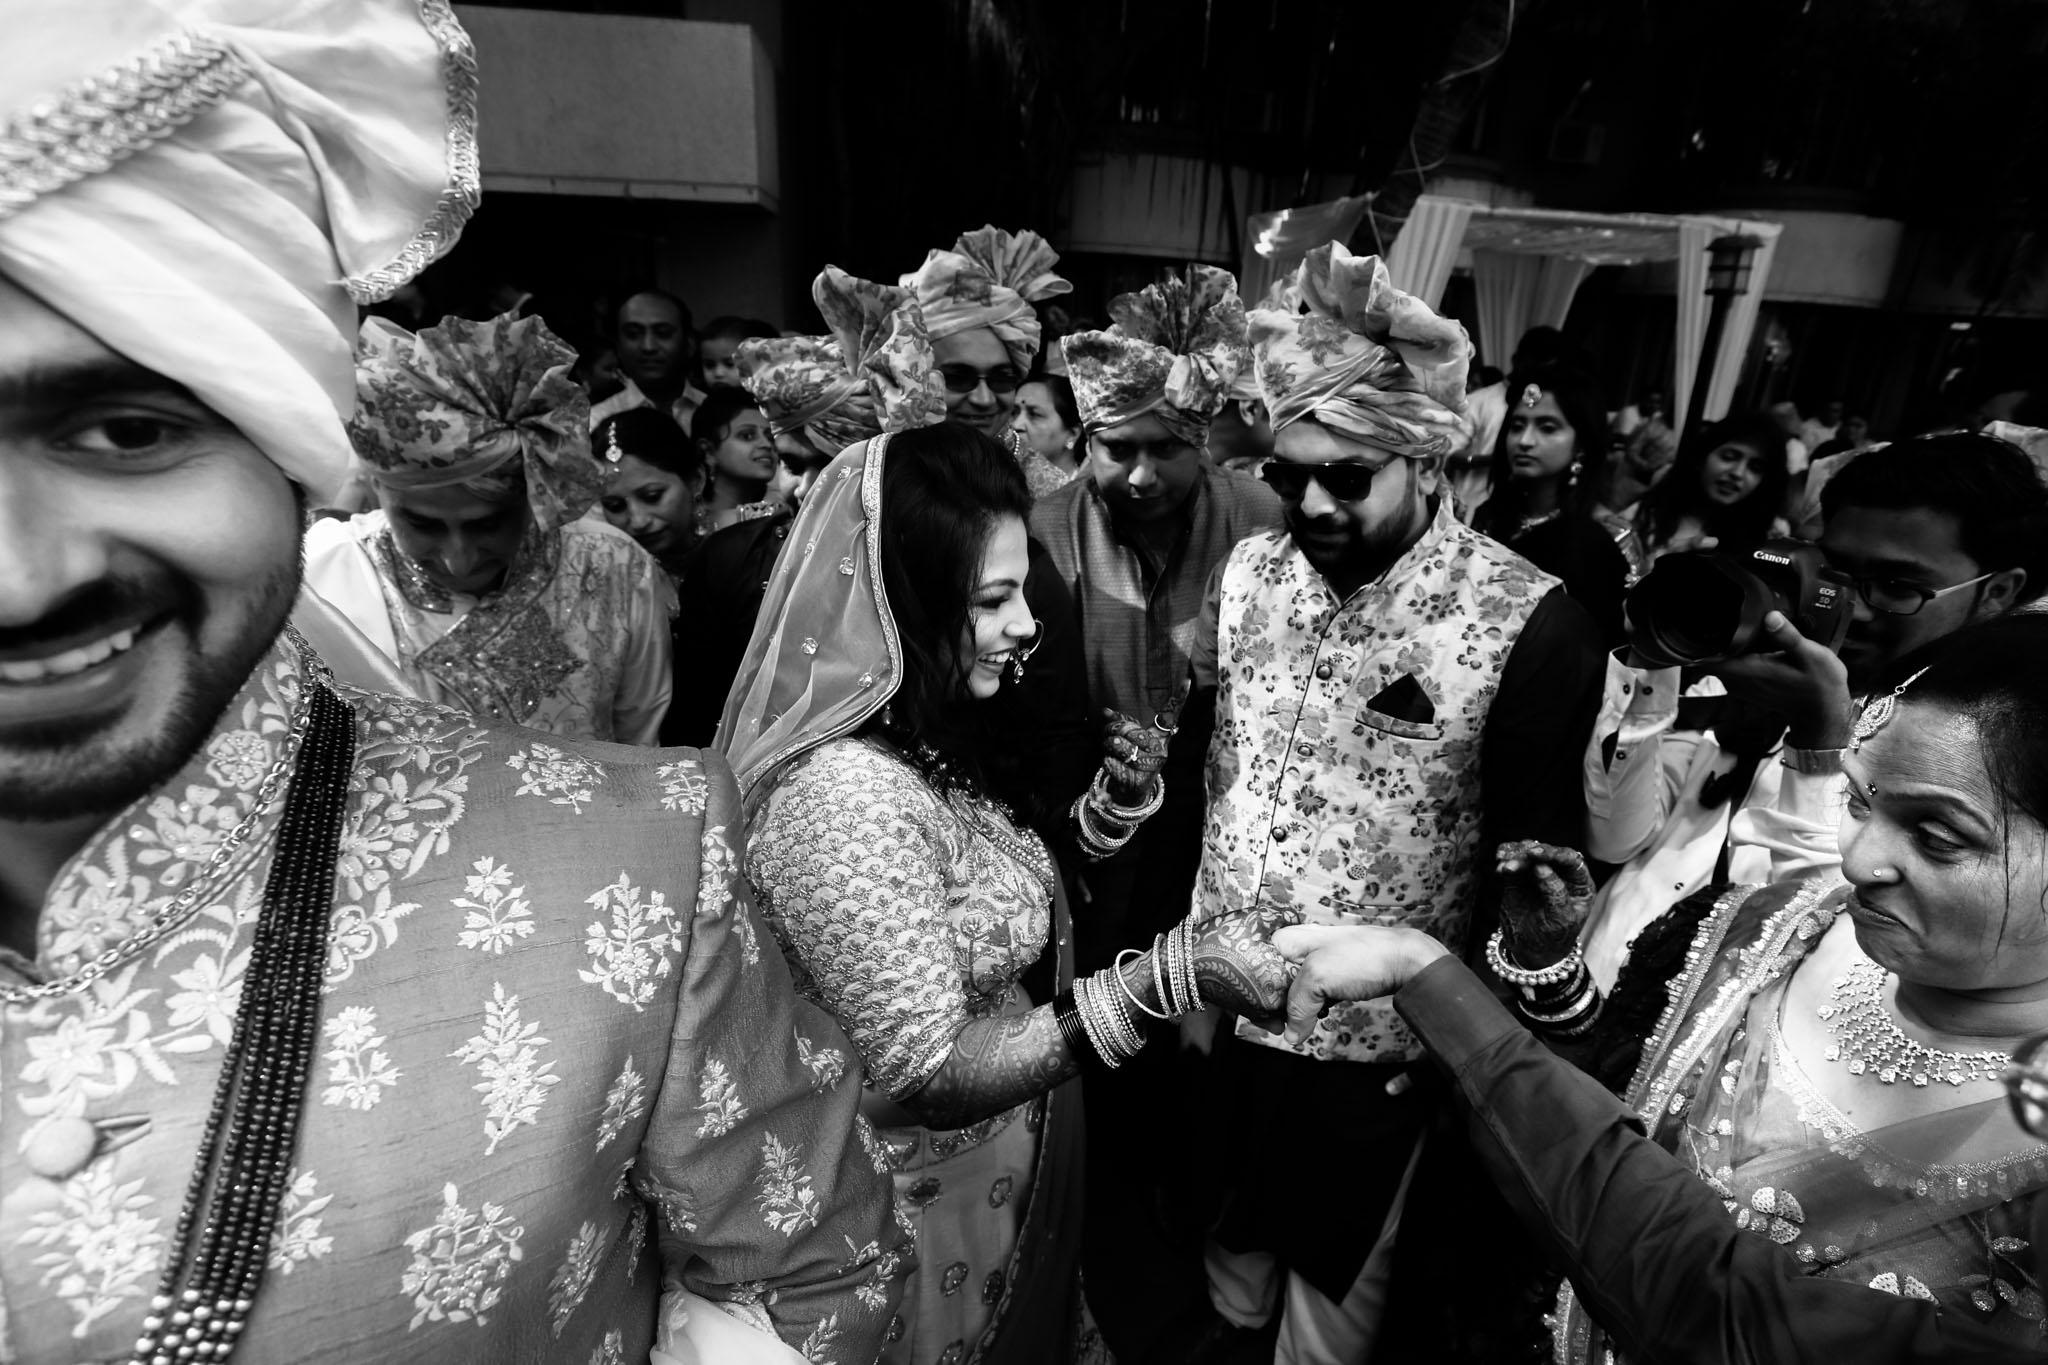 Mukti x Ojas Wedding Akshjay Sansare Photography Best wedding photographer in mumbai India Candid Cinematic Films videos-26.jpg